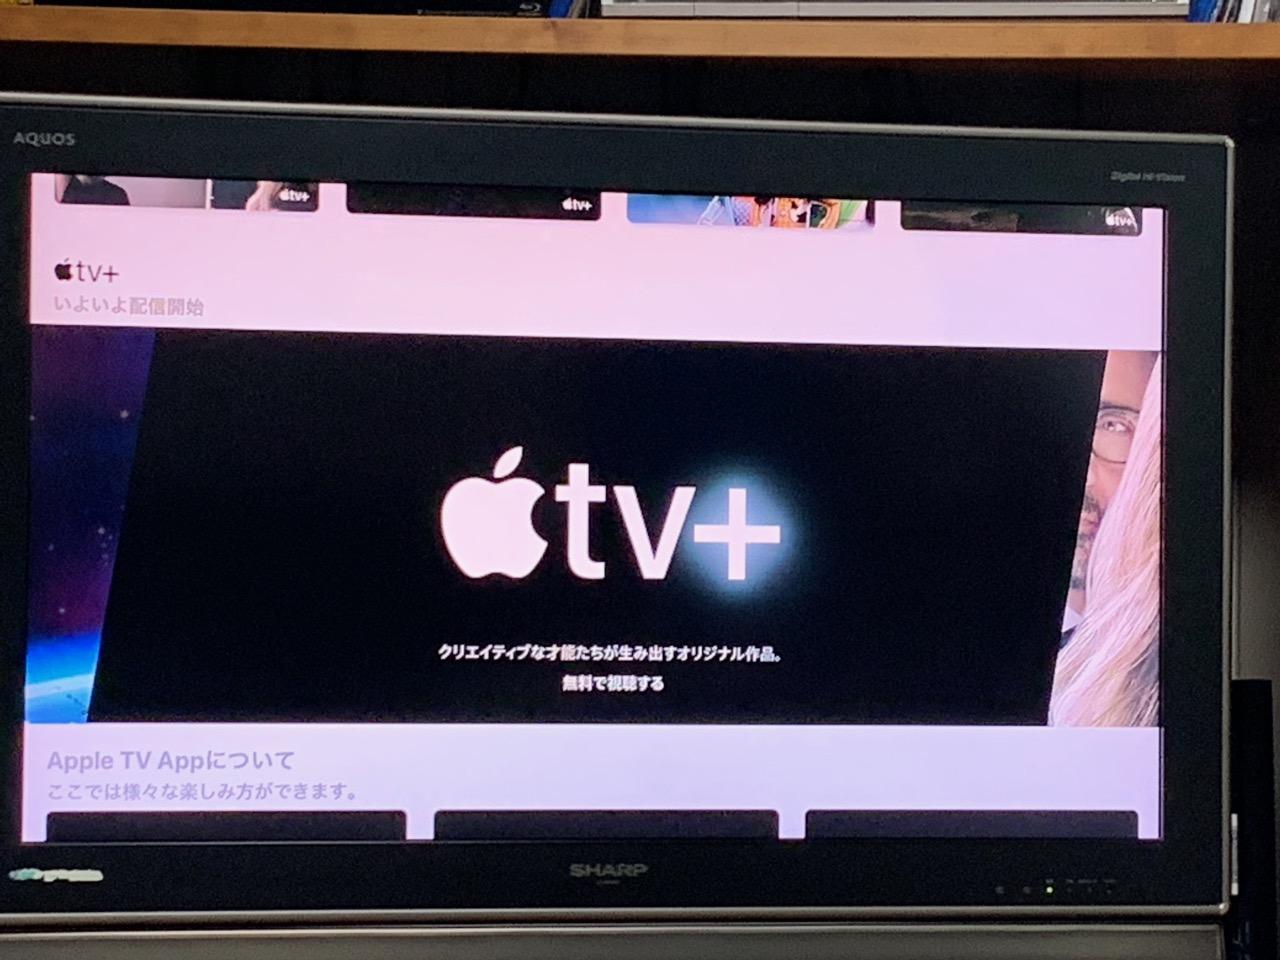 AppleTVはNetflixと勝負する気はさらさらなさそうだ